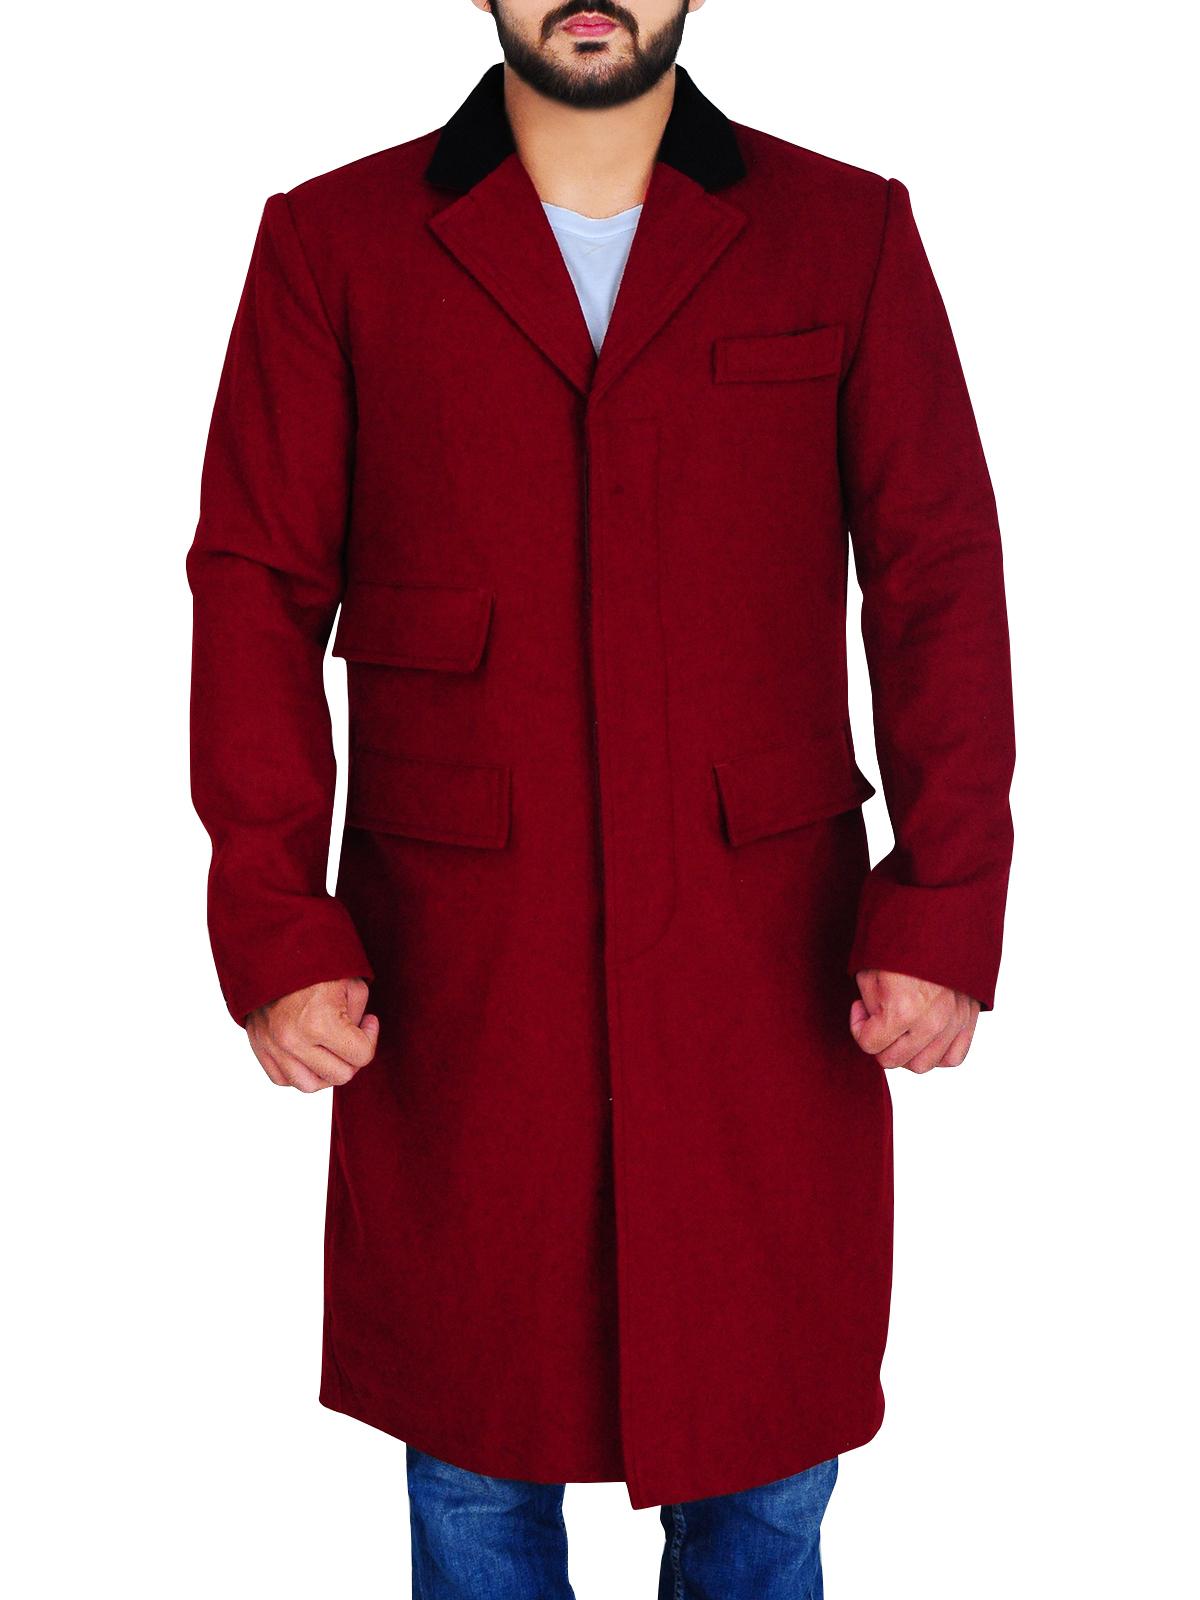 coat hugh jackman burgundy wool coat menswear movies